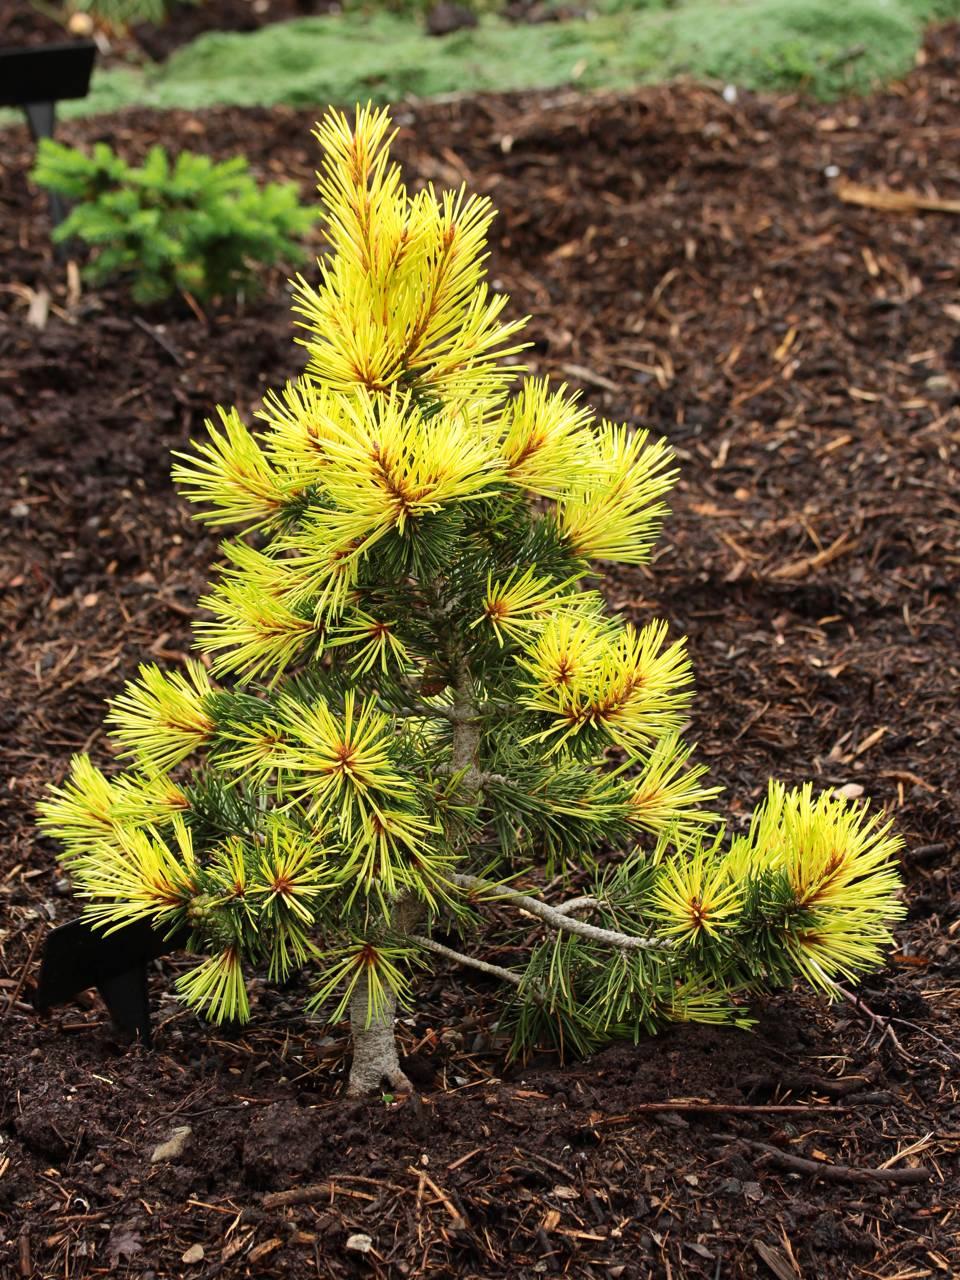 Pinus contorta var. latifolia Taylor's Sunburst conifer evergreen yellow conical